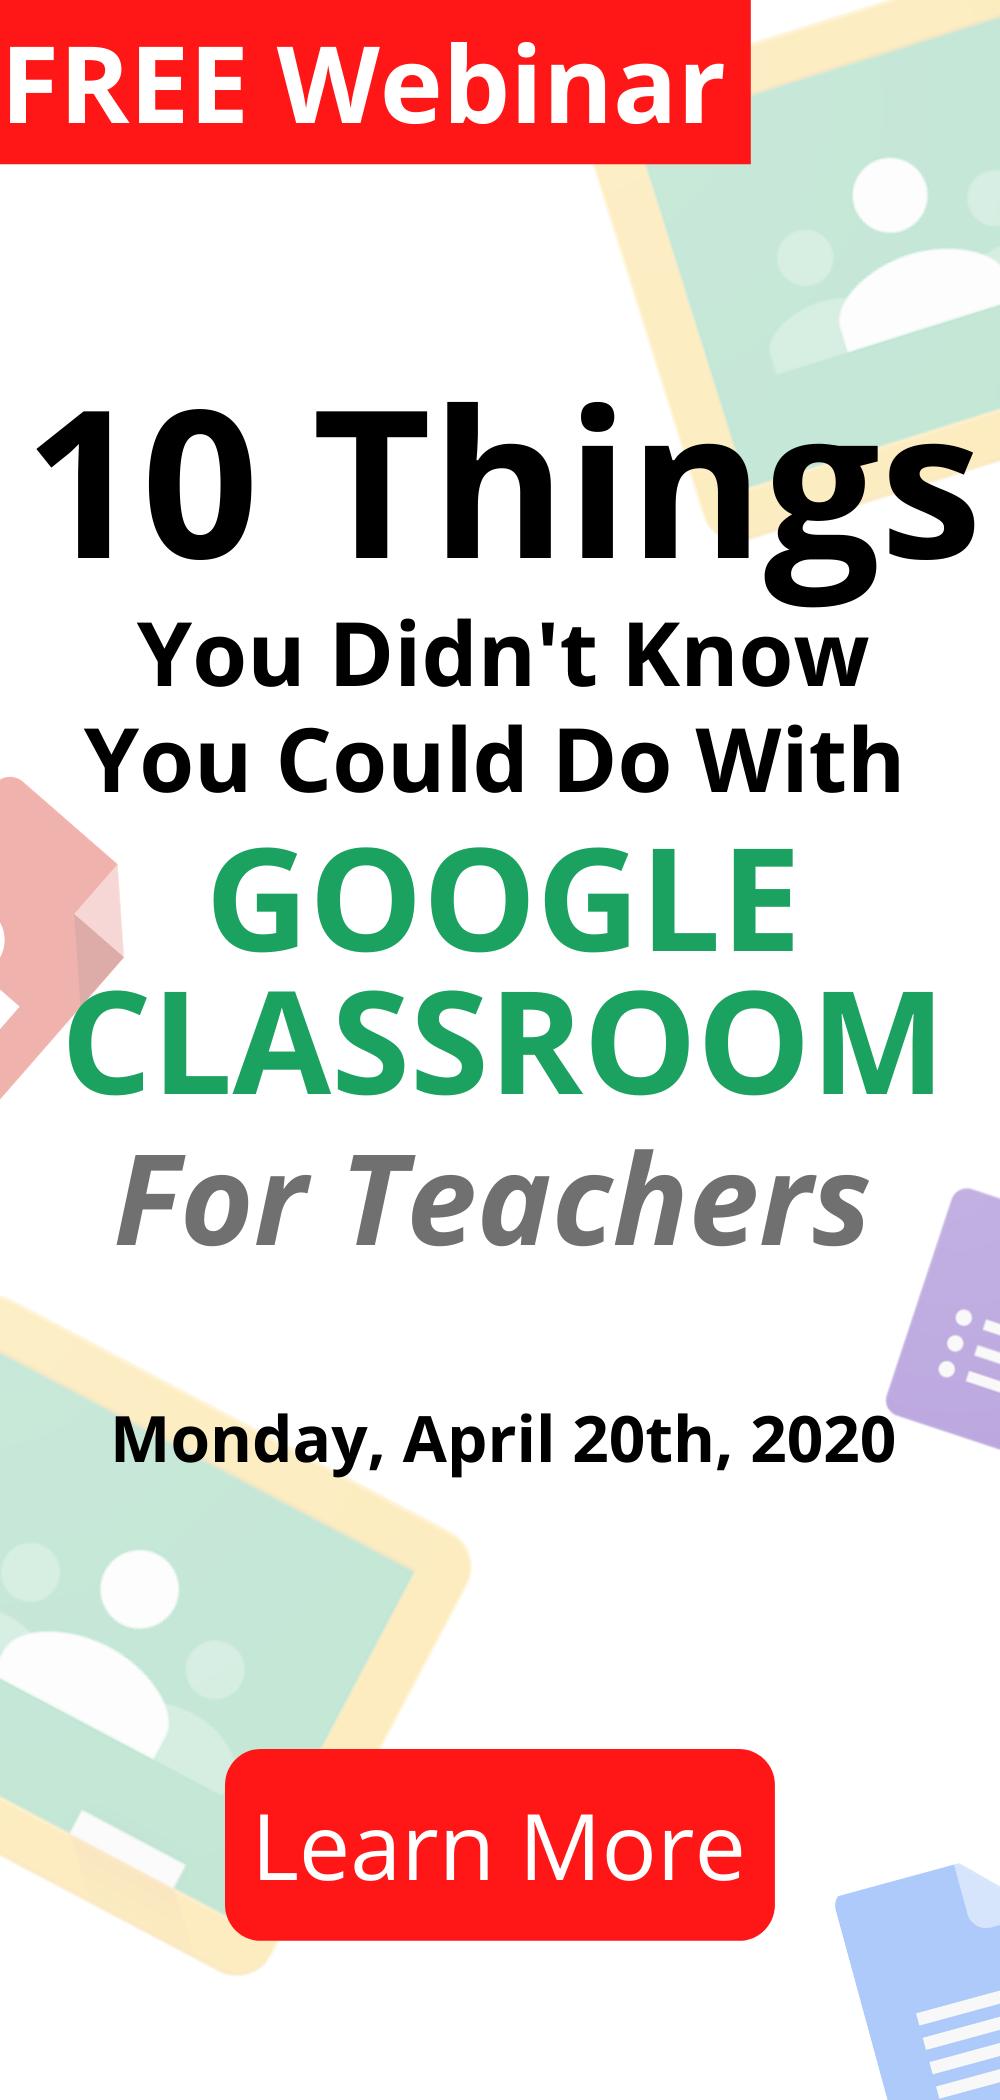 Free Google Classroom Training For Teachers Google Classroom Classroom Training Online Classroom